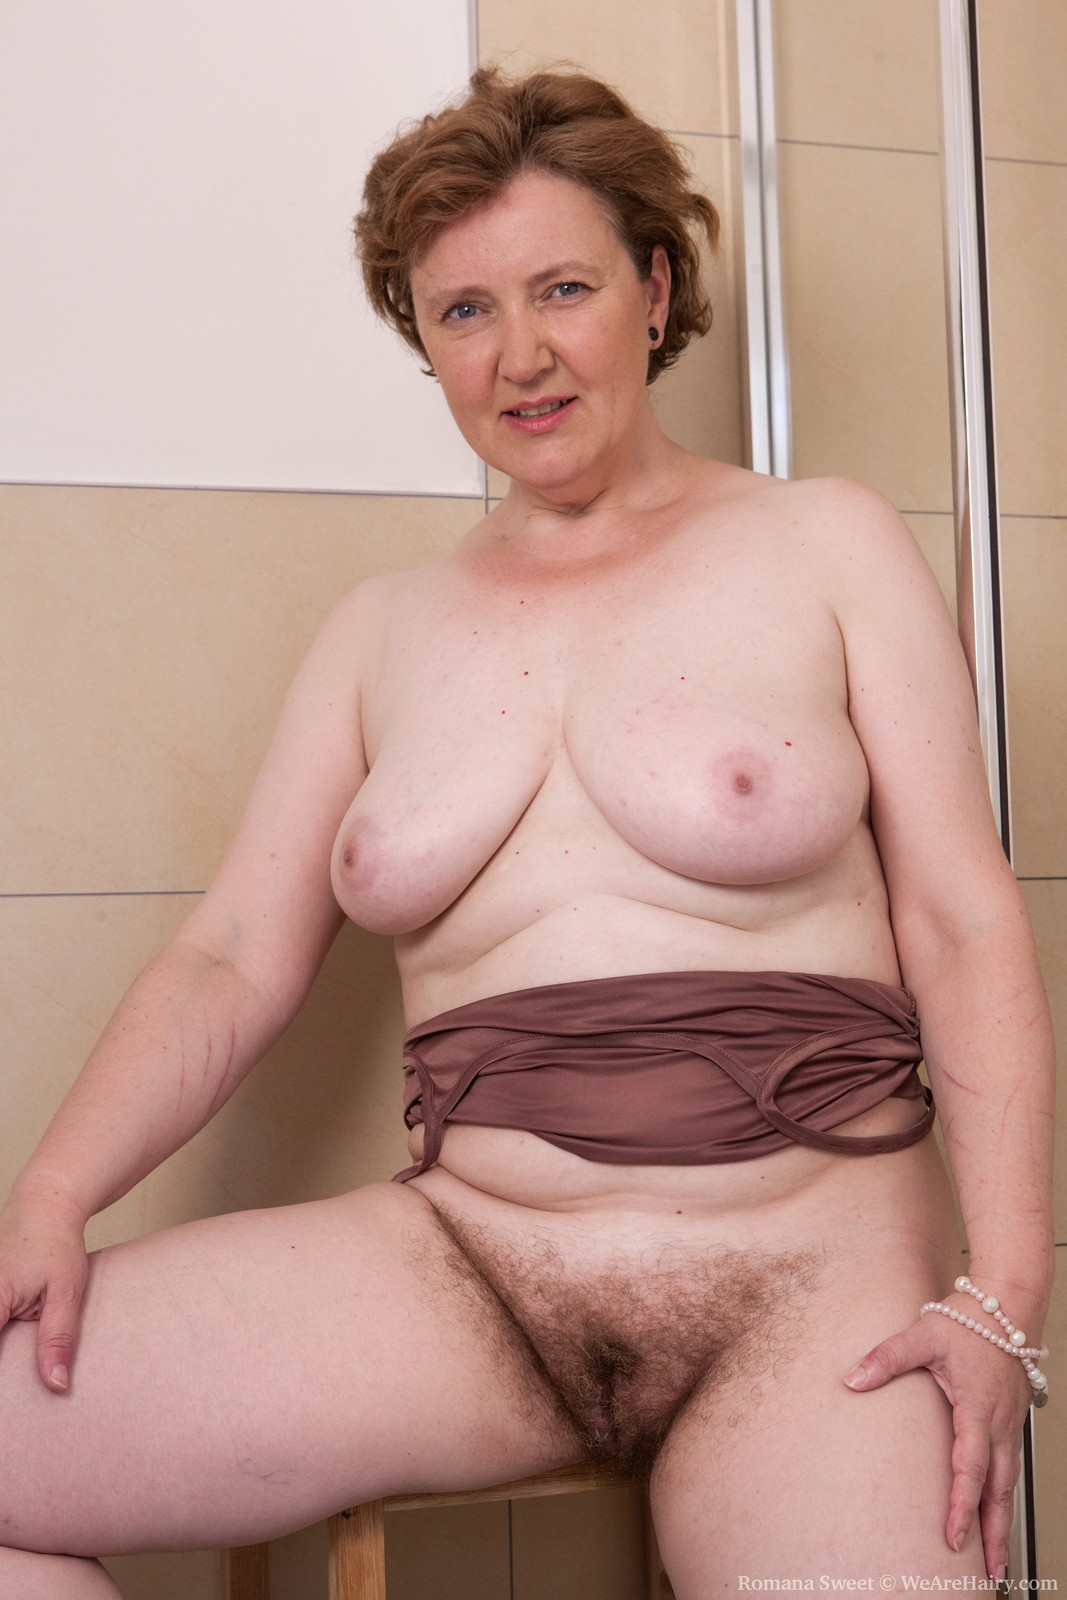 Average amateur women nude